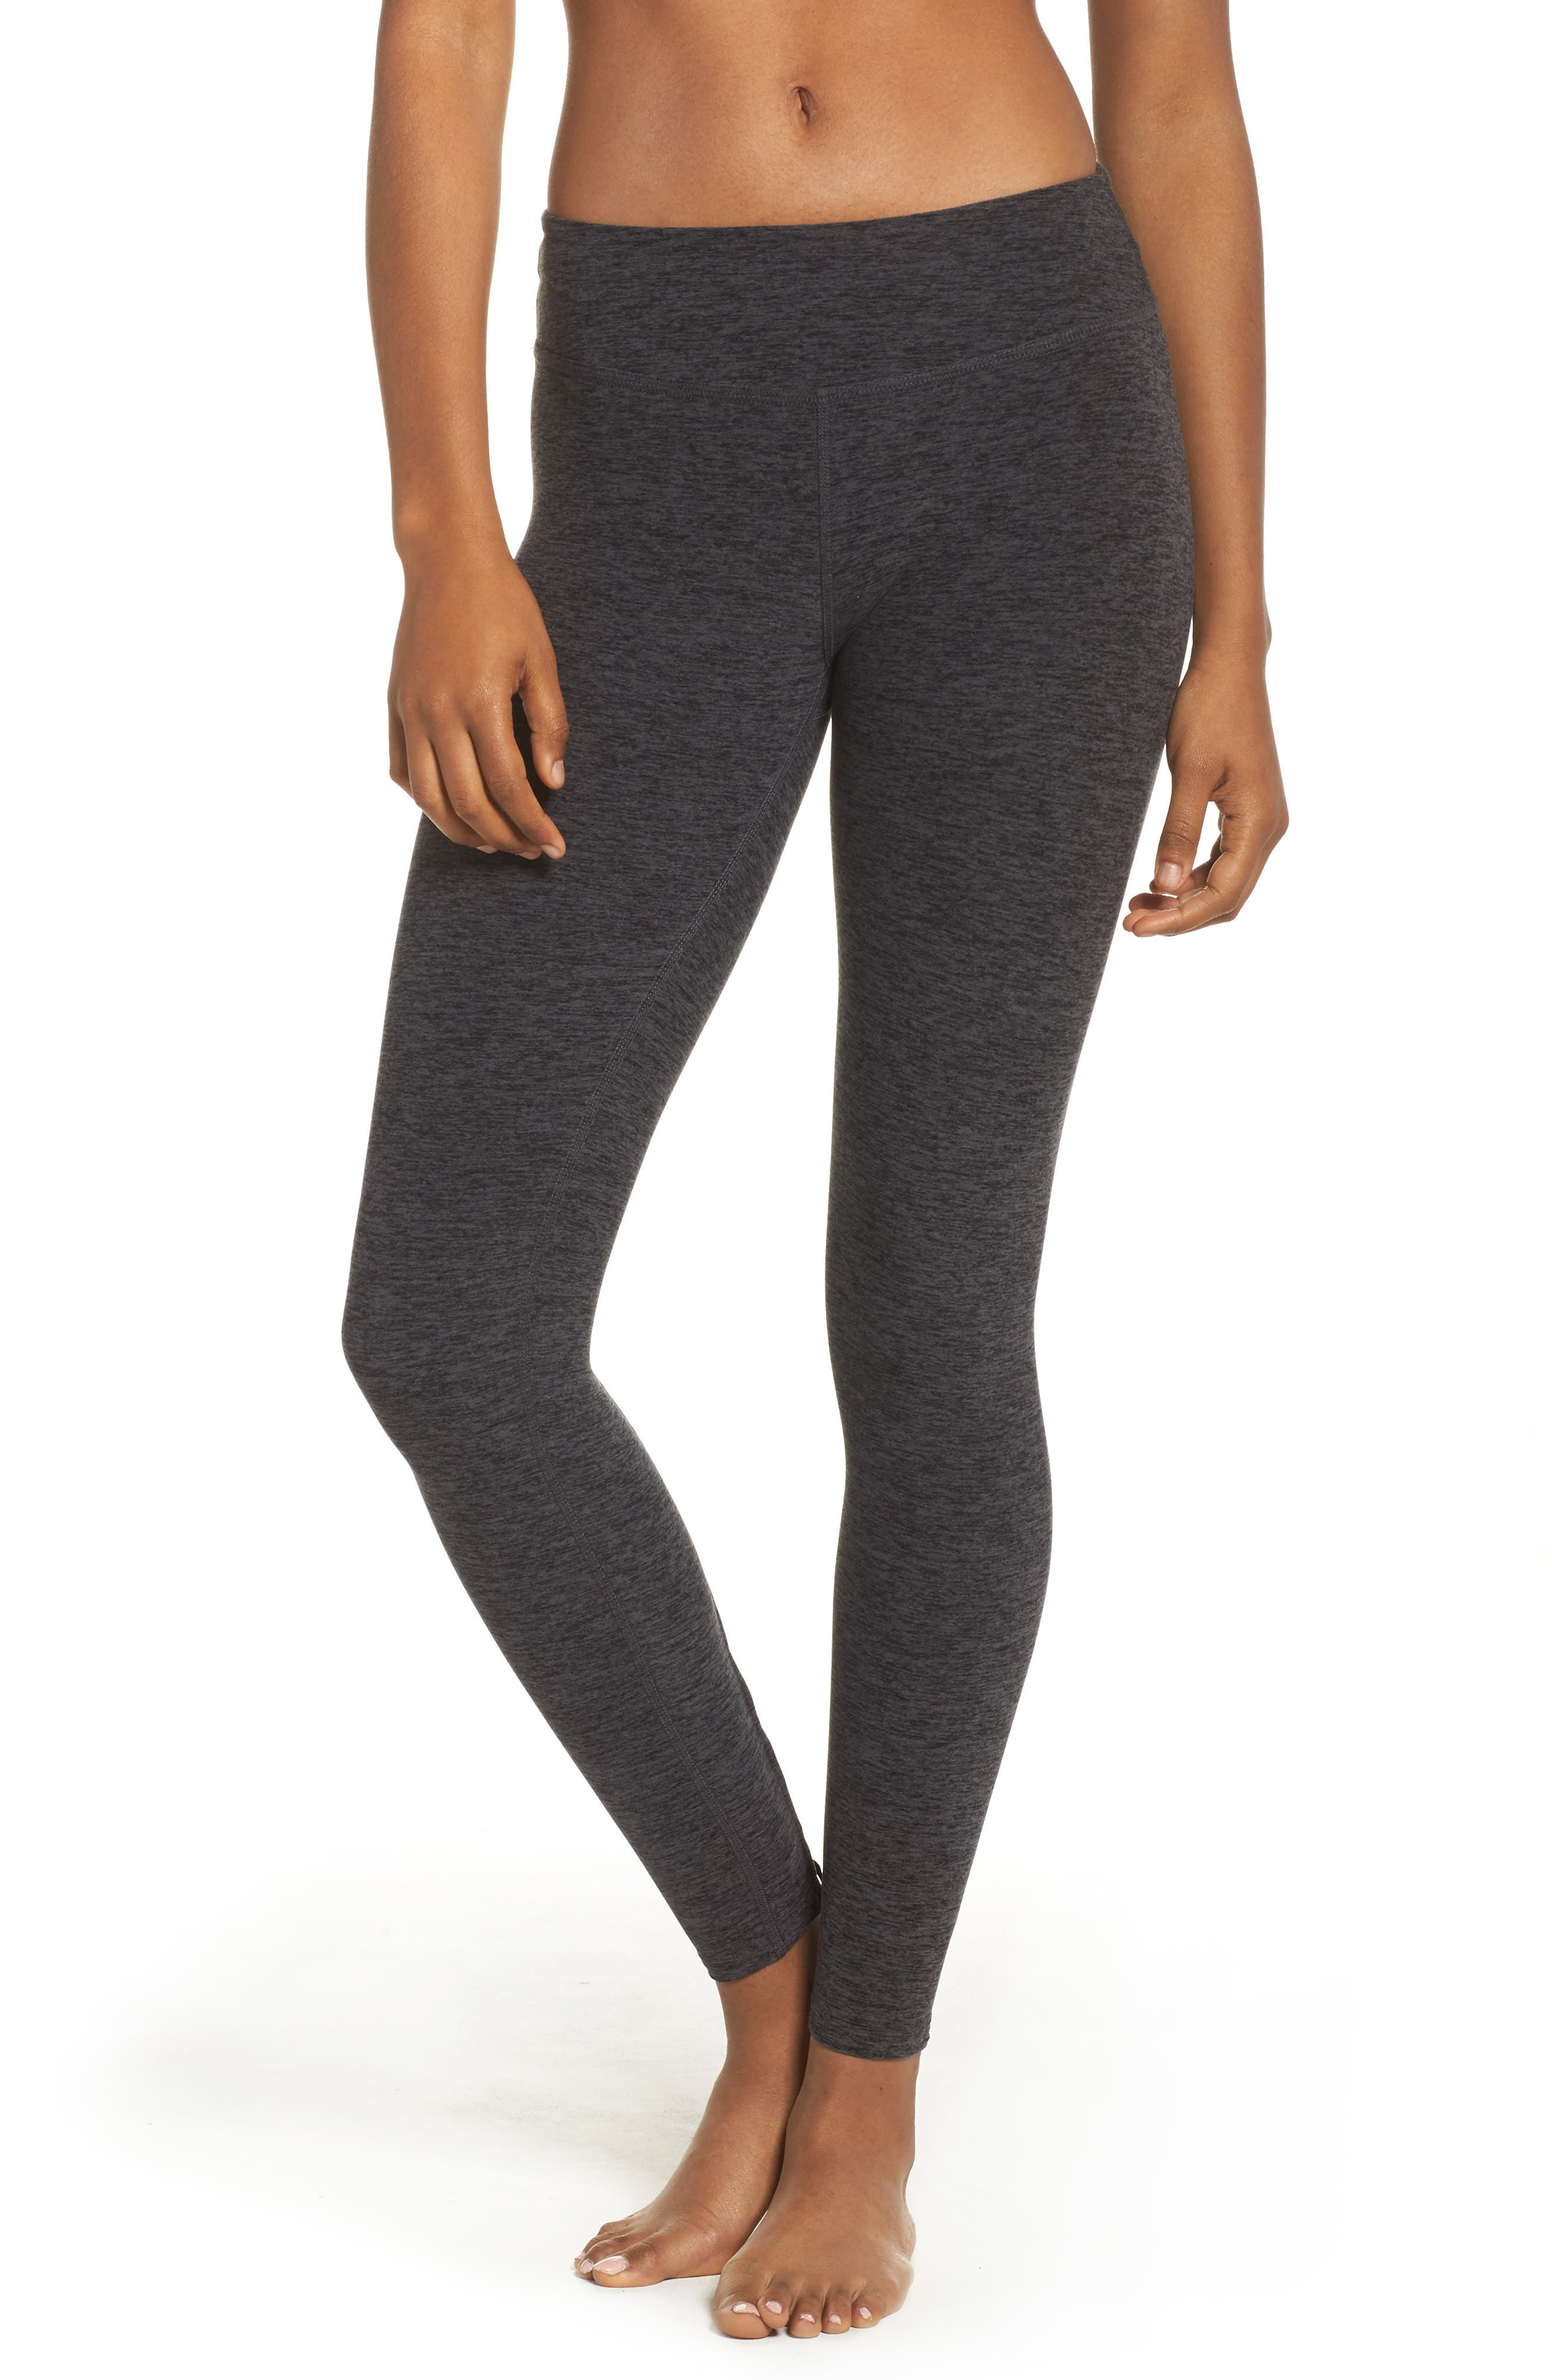 Crisscross Crop Leggings,                         Main,                         color, Black/ Charcoal